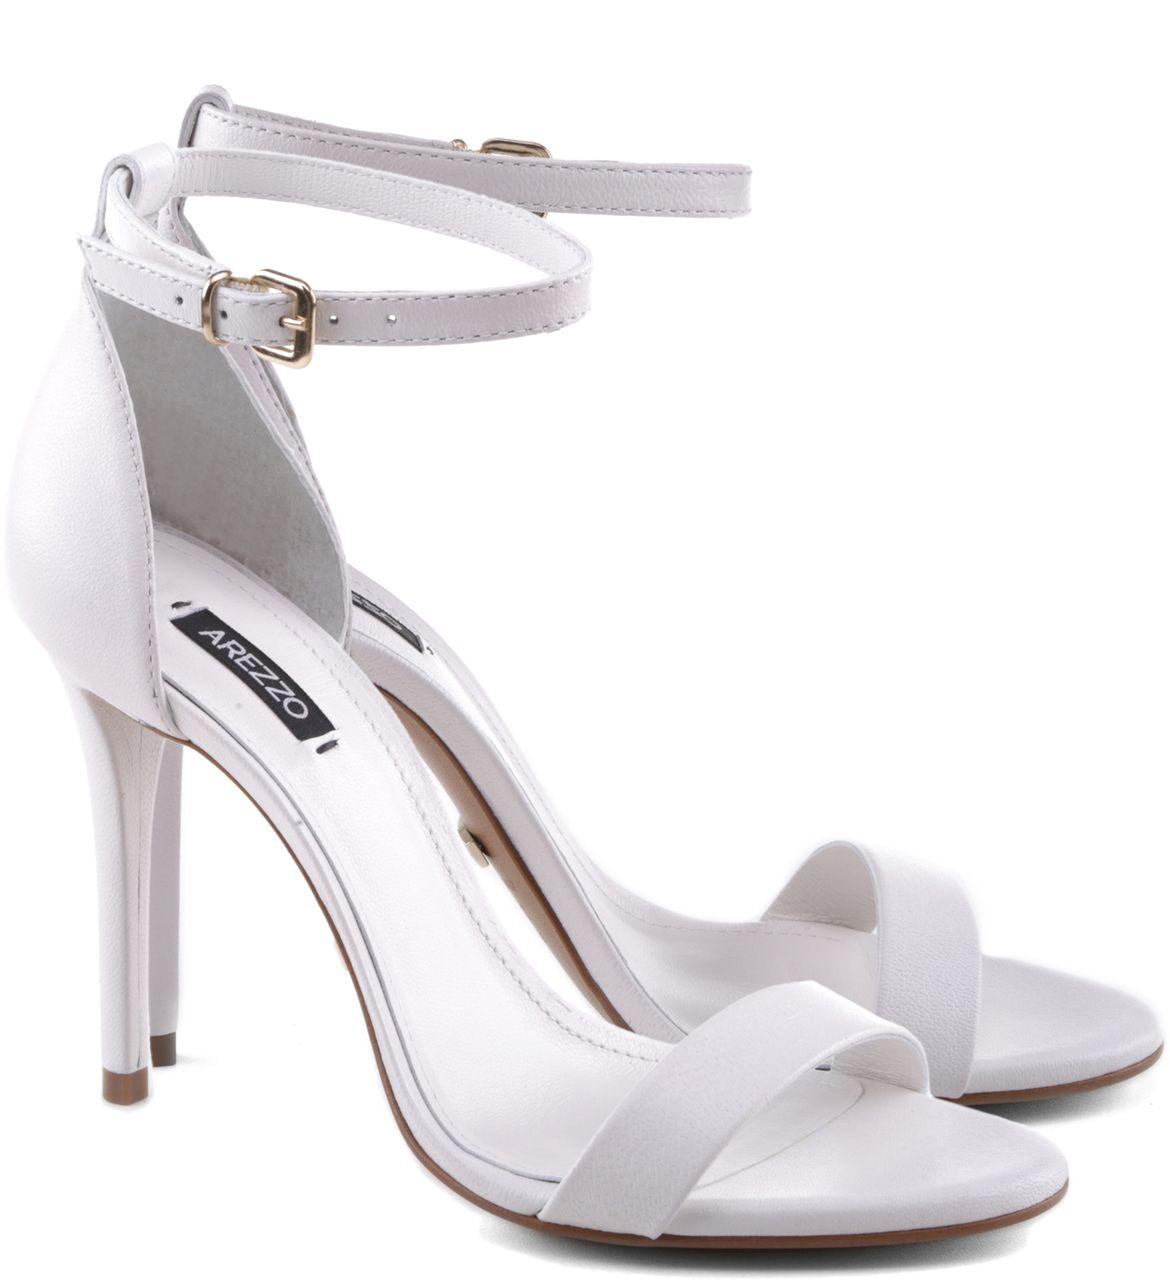 a8c114496 Sandália Isabelli Couro Branca | Arezzo | รองเท้าที่ชอบ | Saltos ...